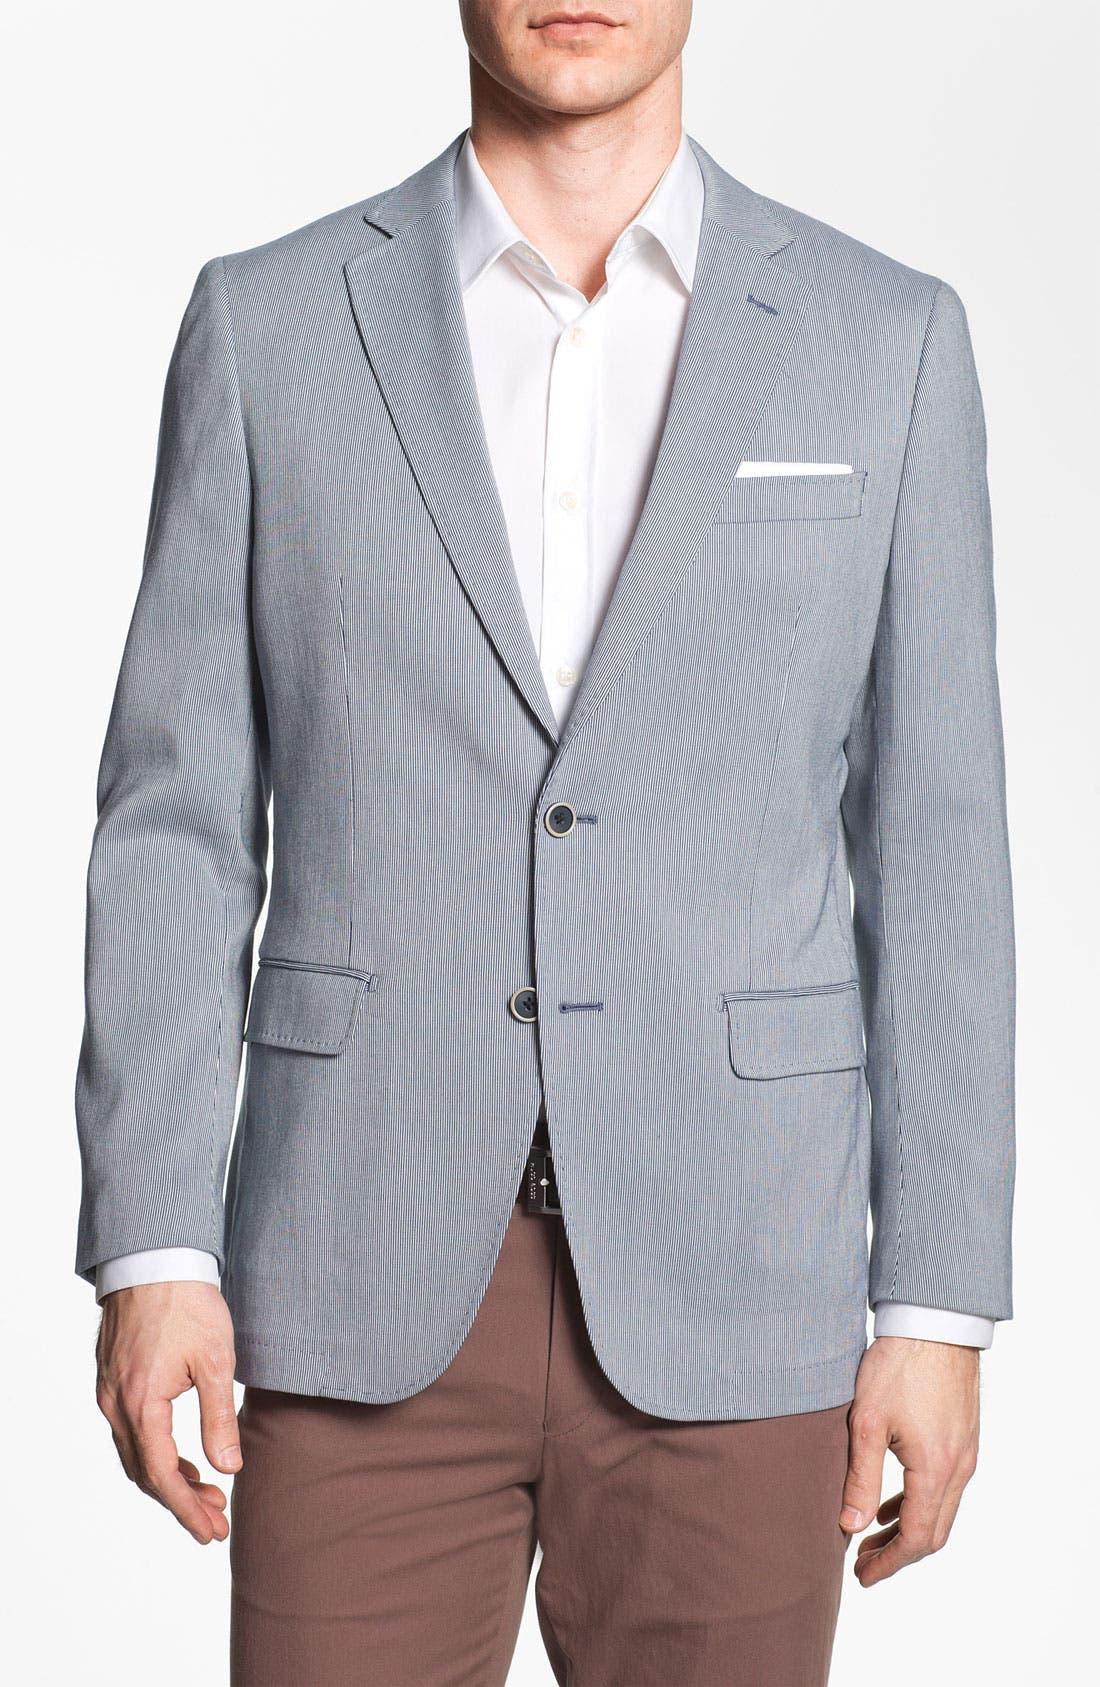 Alternate Image 1 Selected - Michael Kors Trim Fit Cotton Blend Sportcoat